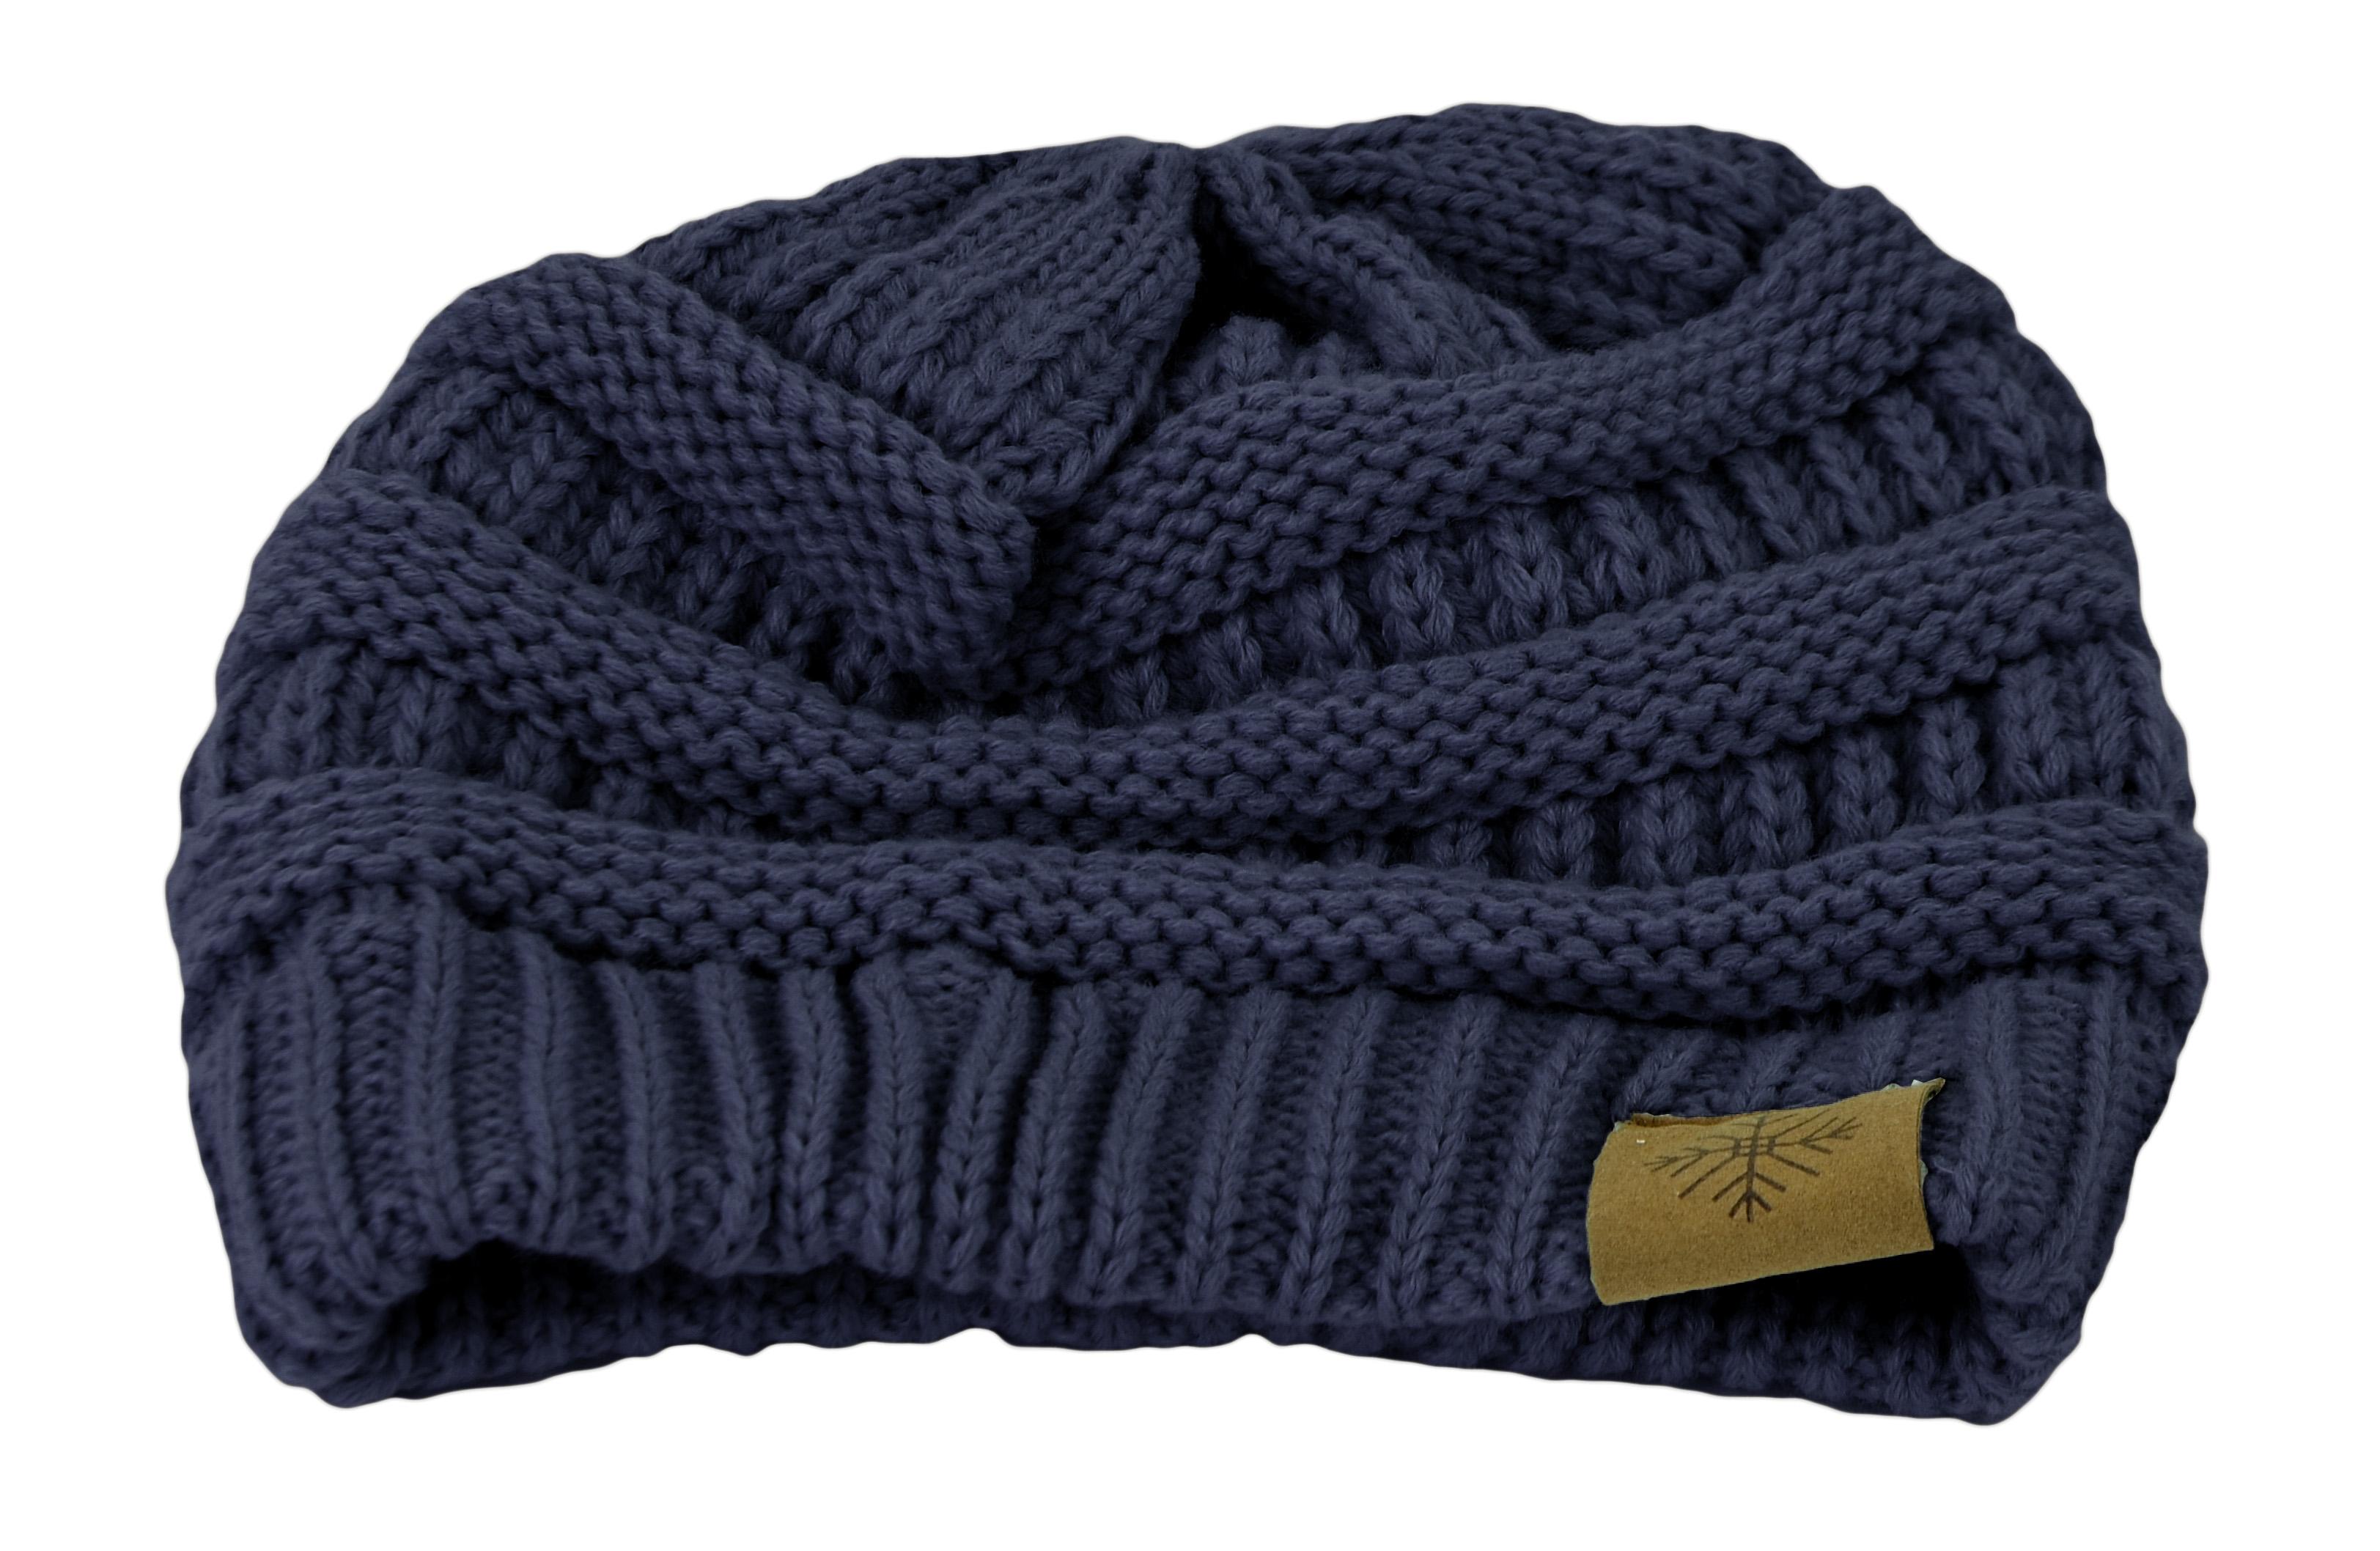 Belle Donne - Women's Winter Fleece Lined Cable Knitted Pom Pom Beanie Hat - Navy Blue